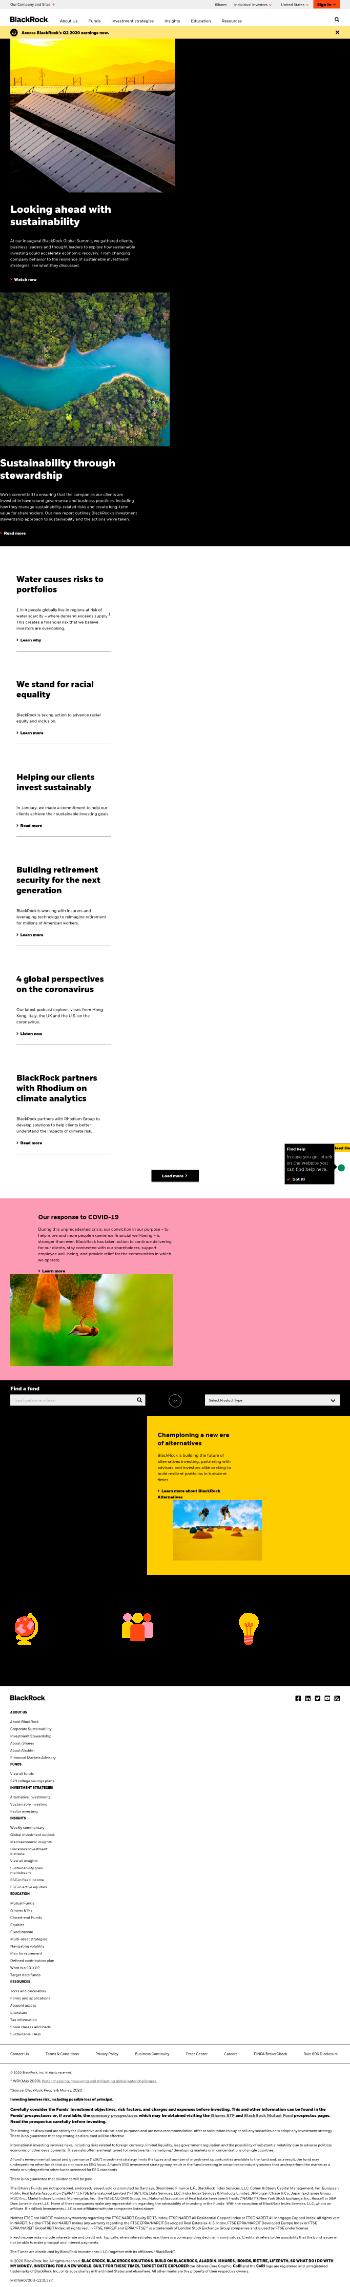 BlackRock Enhanced Global Dividend Trust Website Screenshot